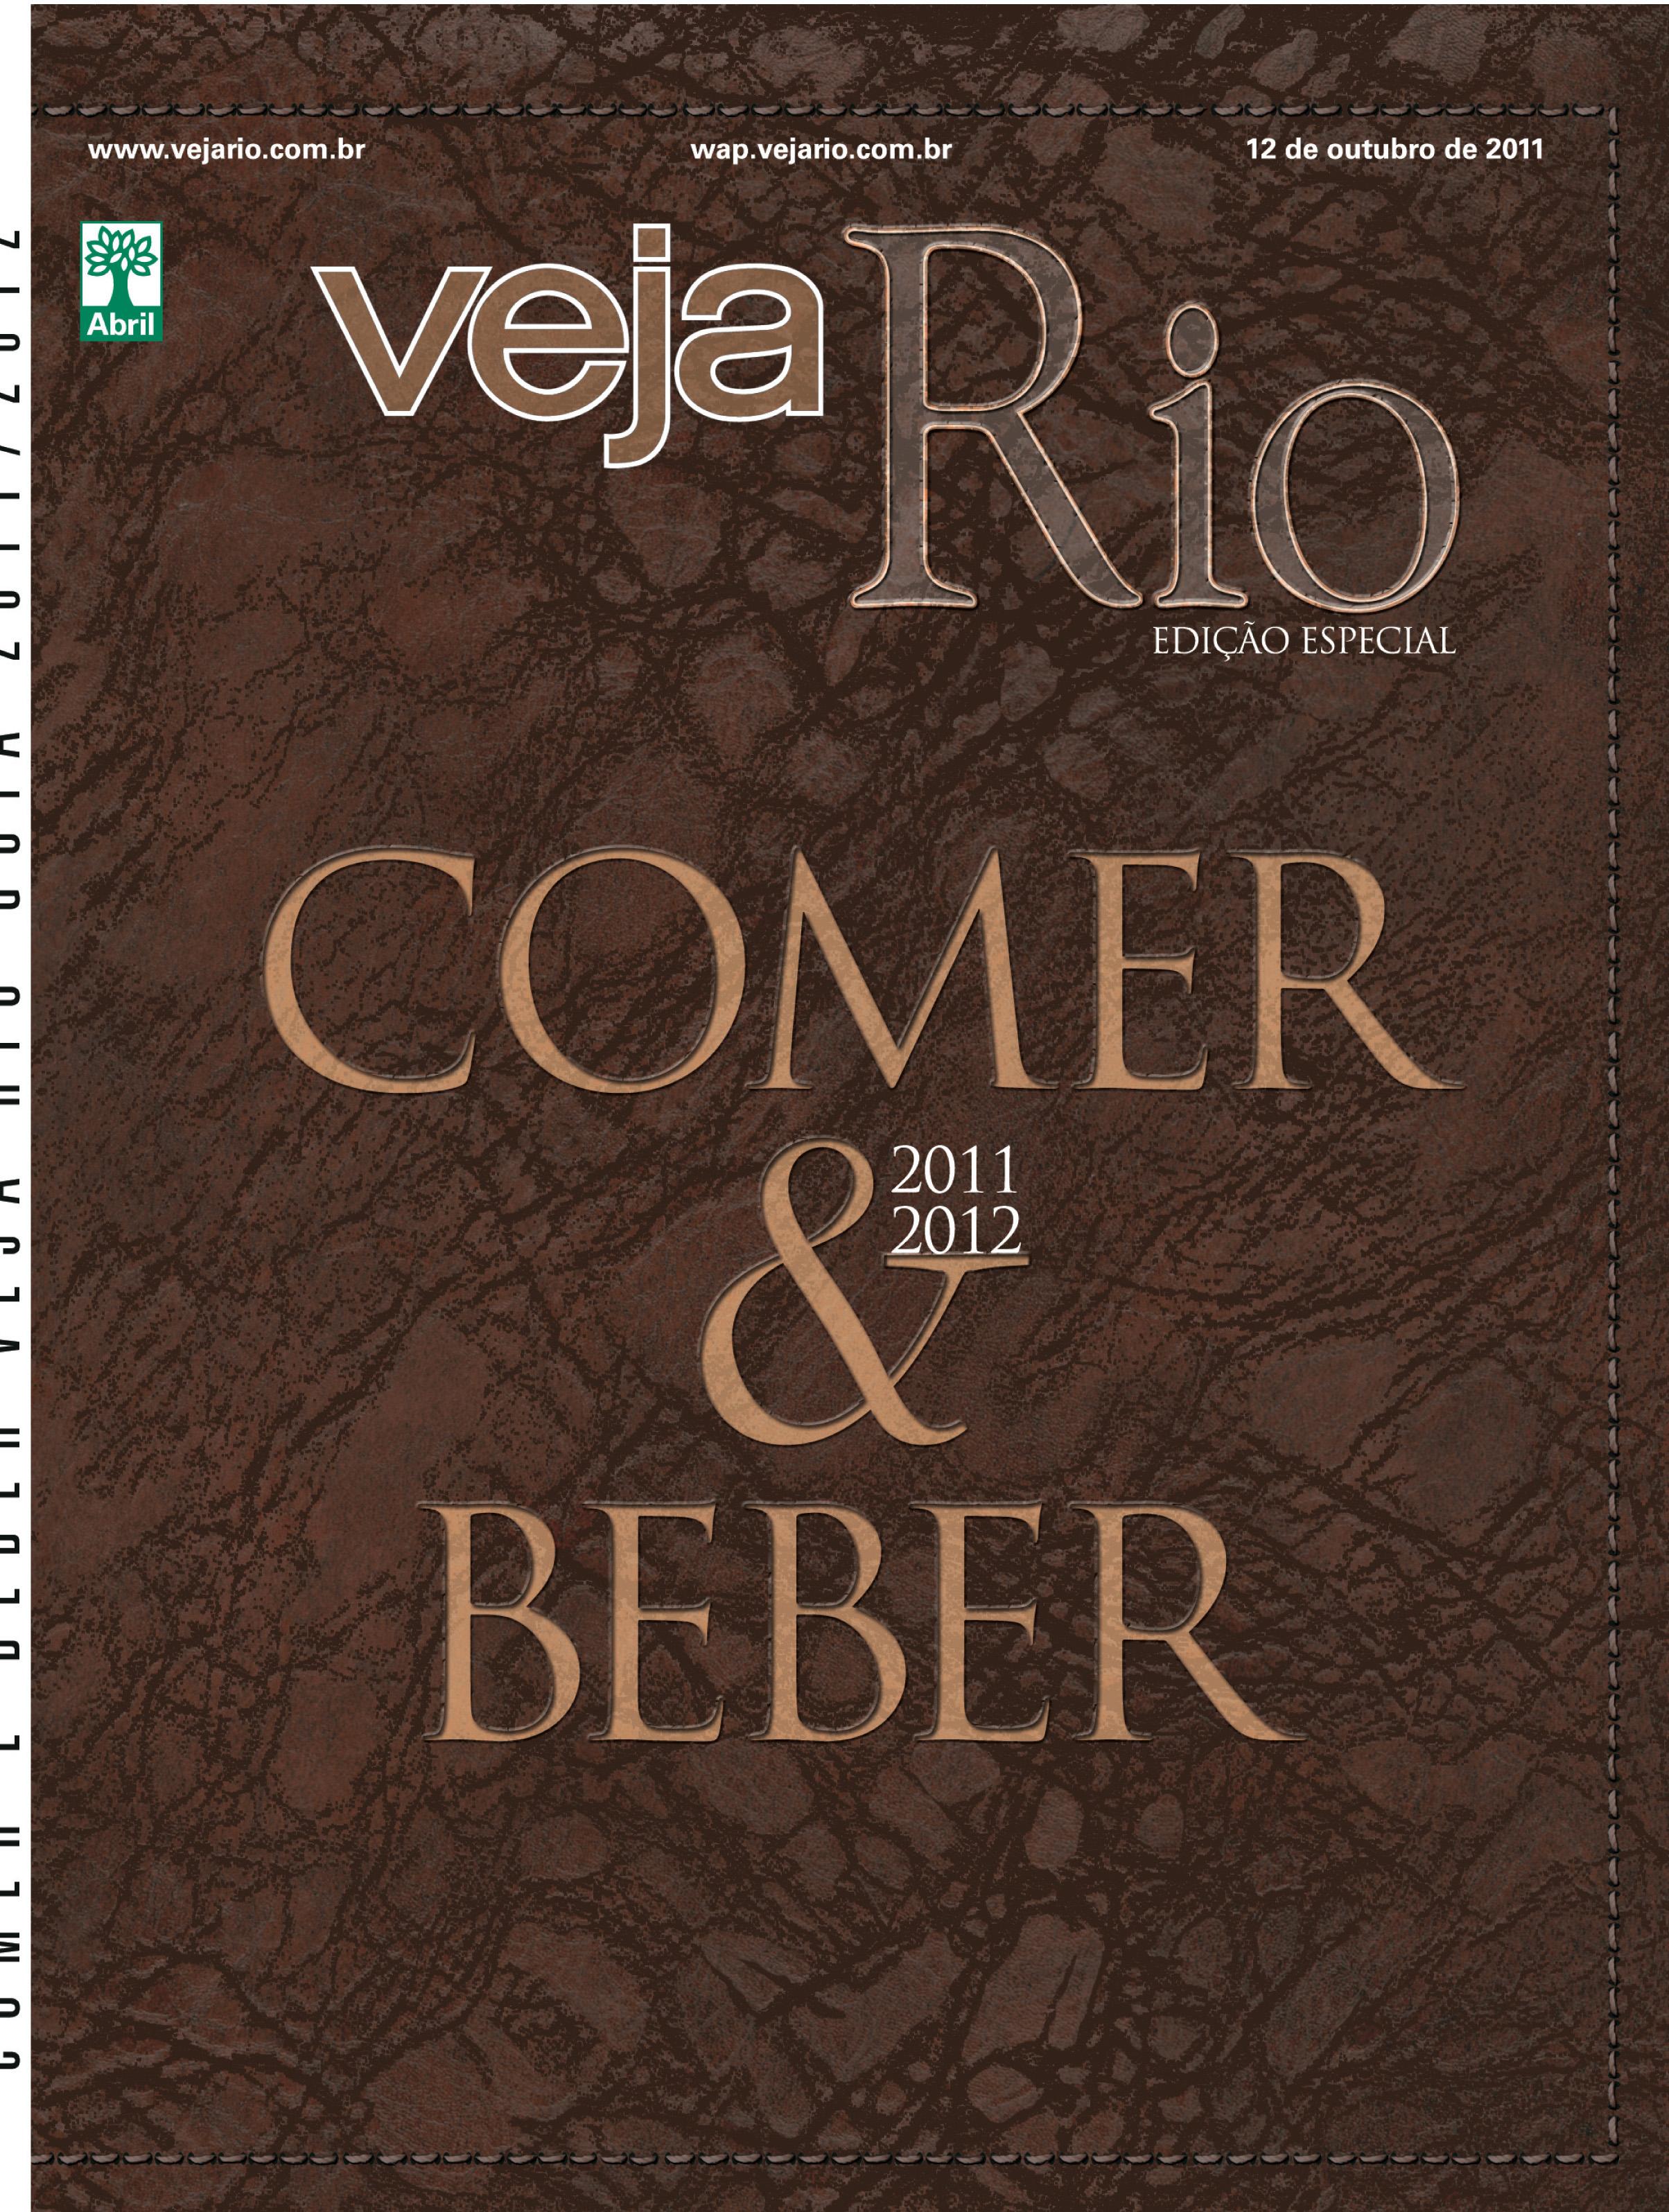 Capa da revista Veja Rio especial Comer e Beber, de 12 de outubro de 2011